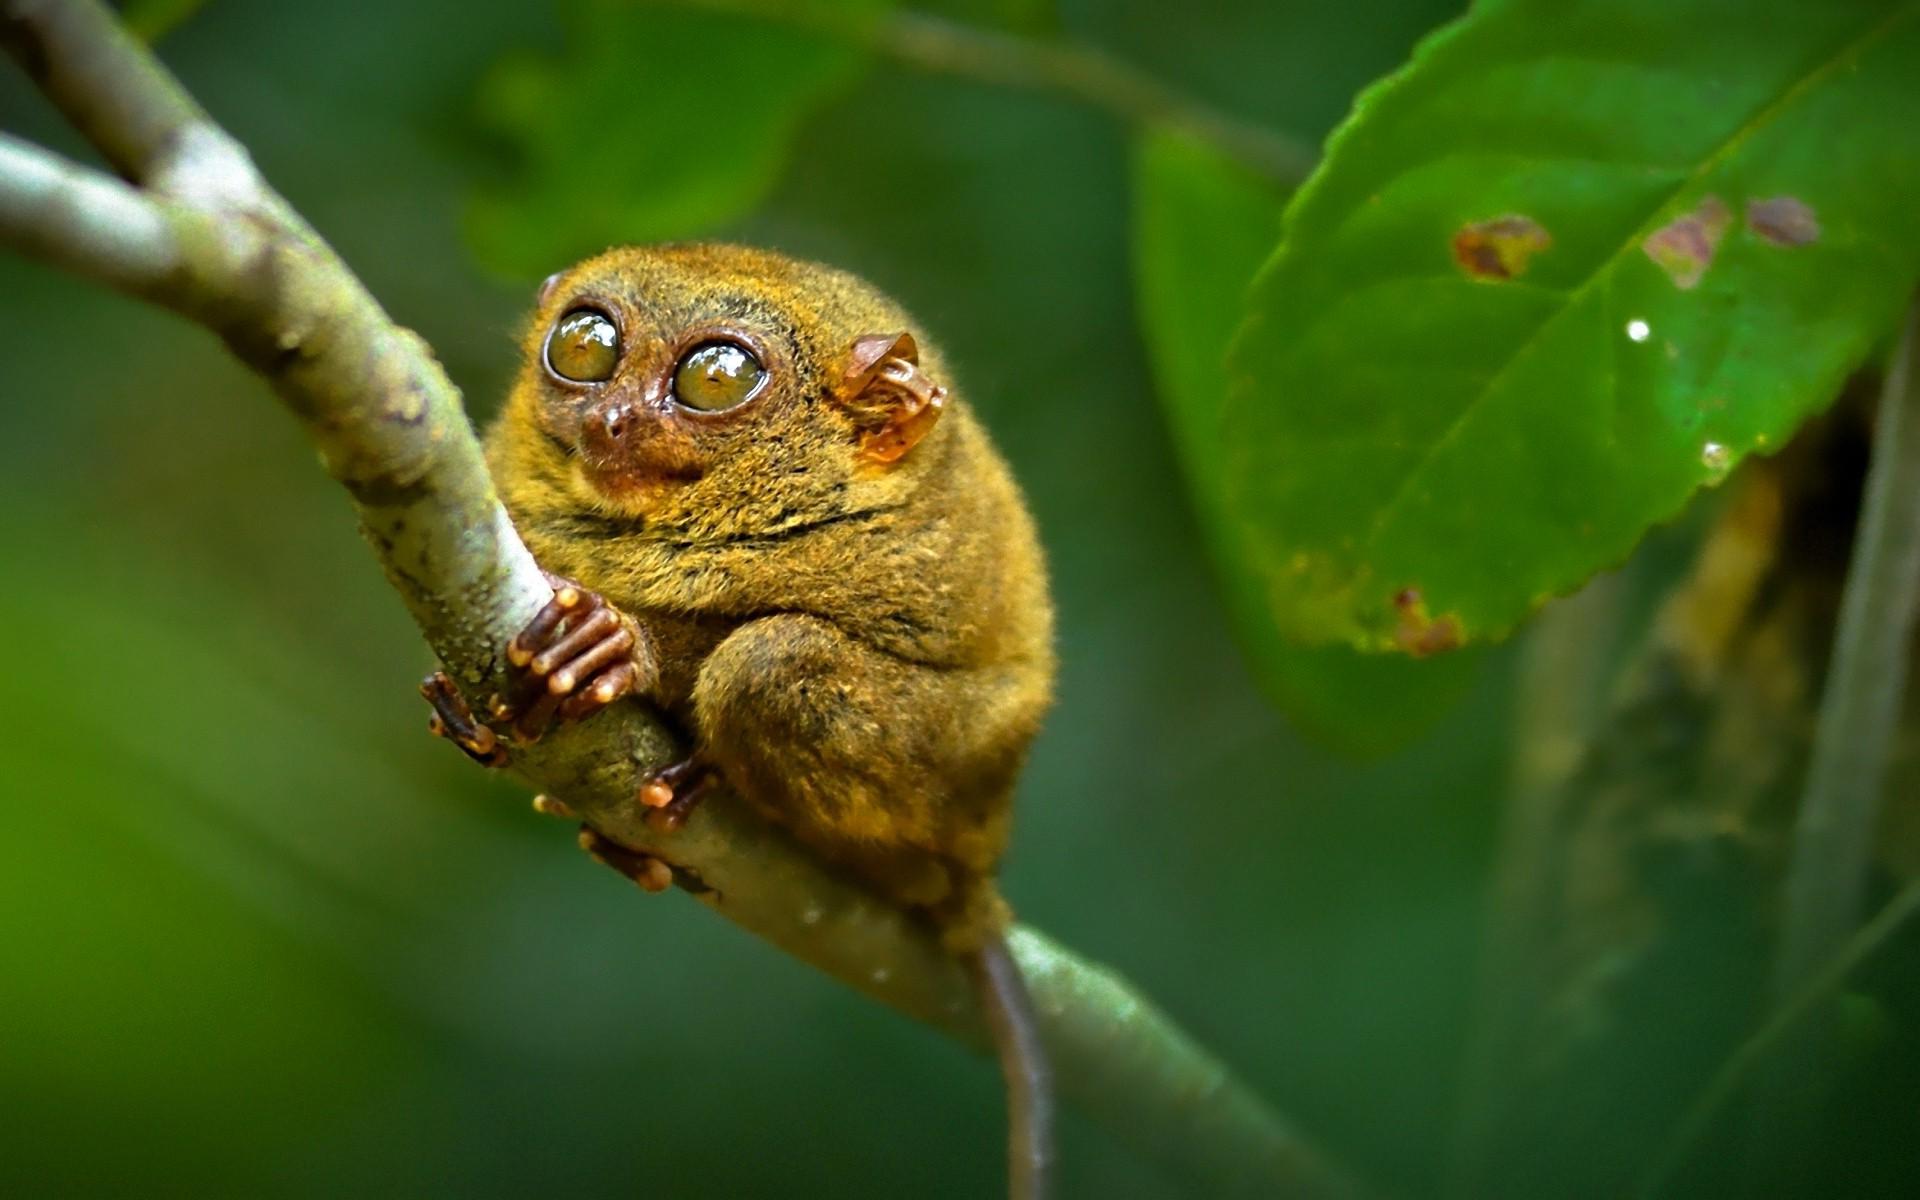 Good Lemur Wallpaper - animals-nature-branch-green-wildlife-frog-amphibian-beak-flower-lemur-fauna-1920x1200-px-vertebrate-close-up-macro-photography-tree-frog-monkeys-726699  You Should Have_5715.jpg